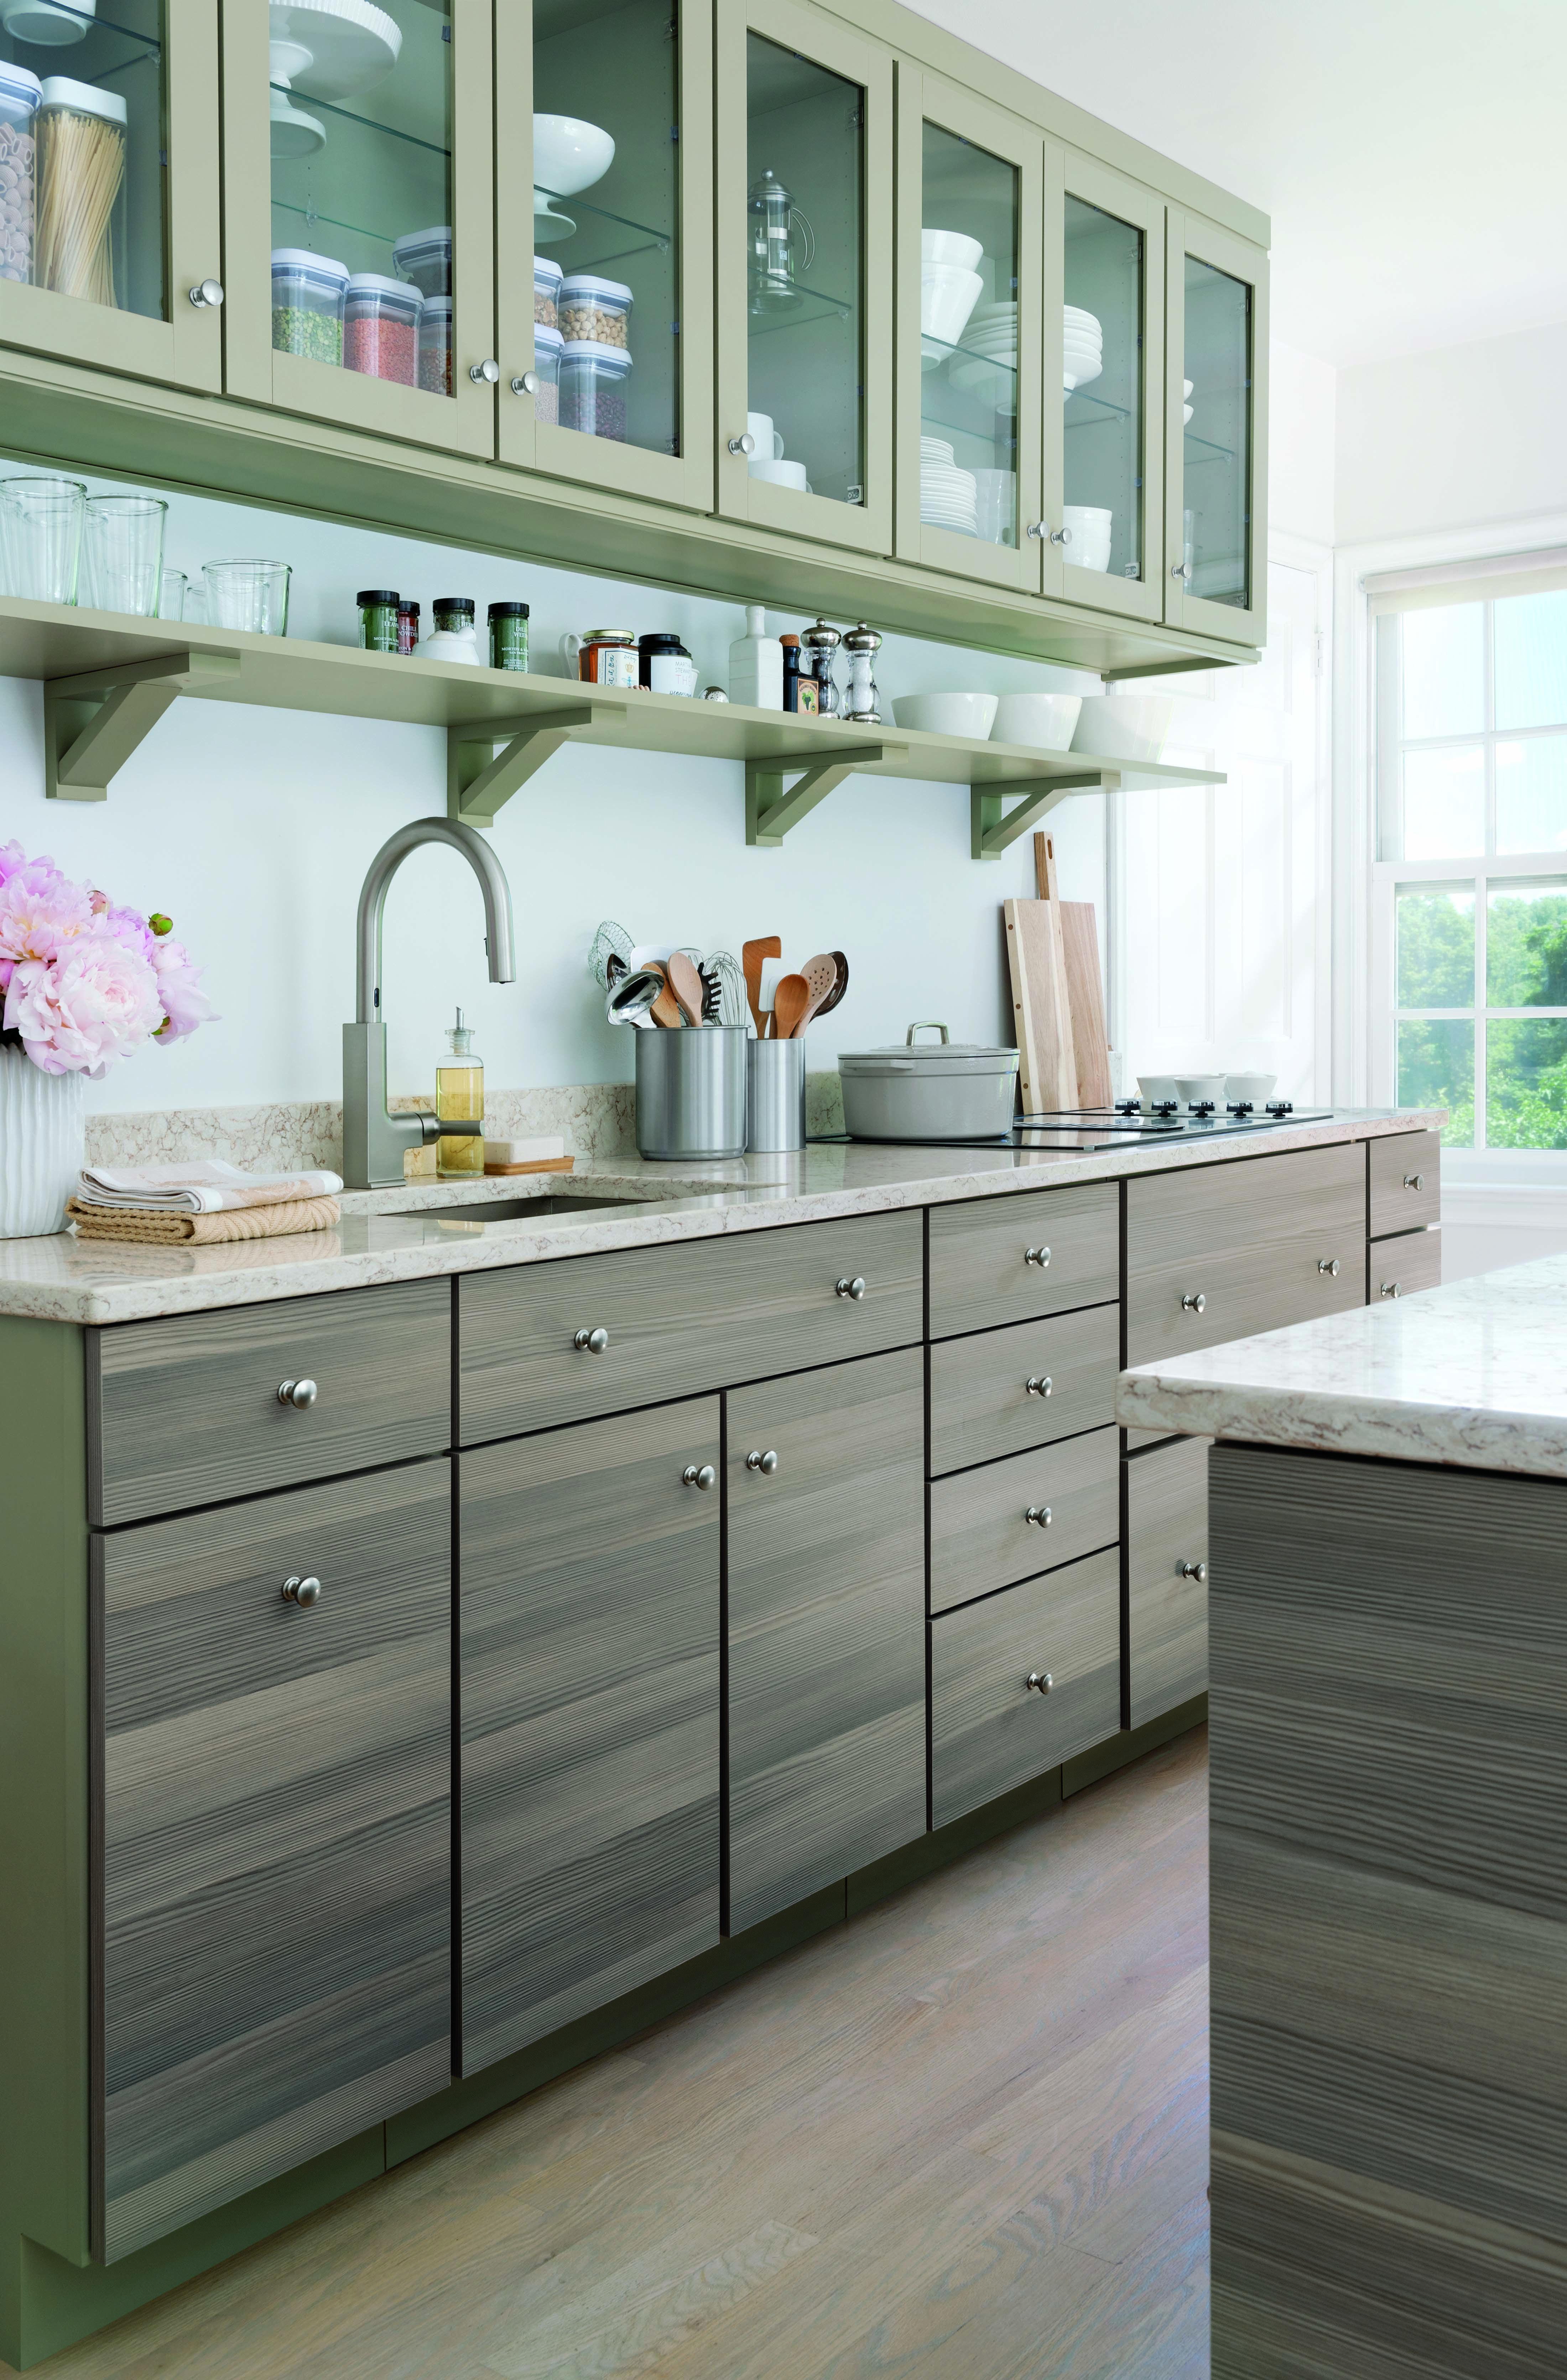 Sleek Modern And Organized Just Like You Your Martha Stewart Living Dream Kitchen Awaits Ho Martha Stewart Living Kitchen Kitchen Makeover Kitchen Remodel